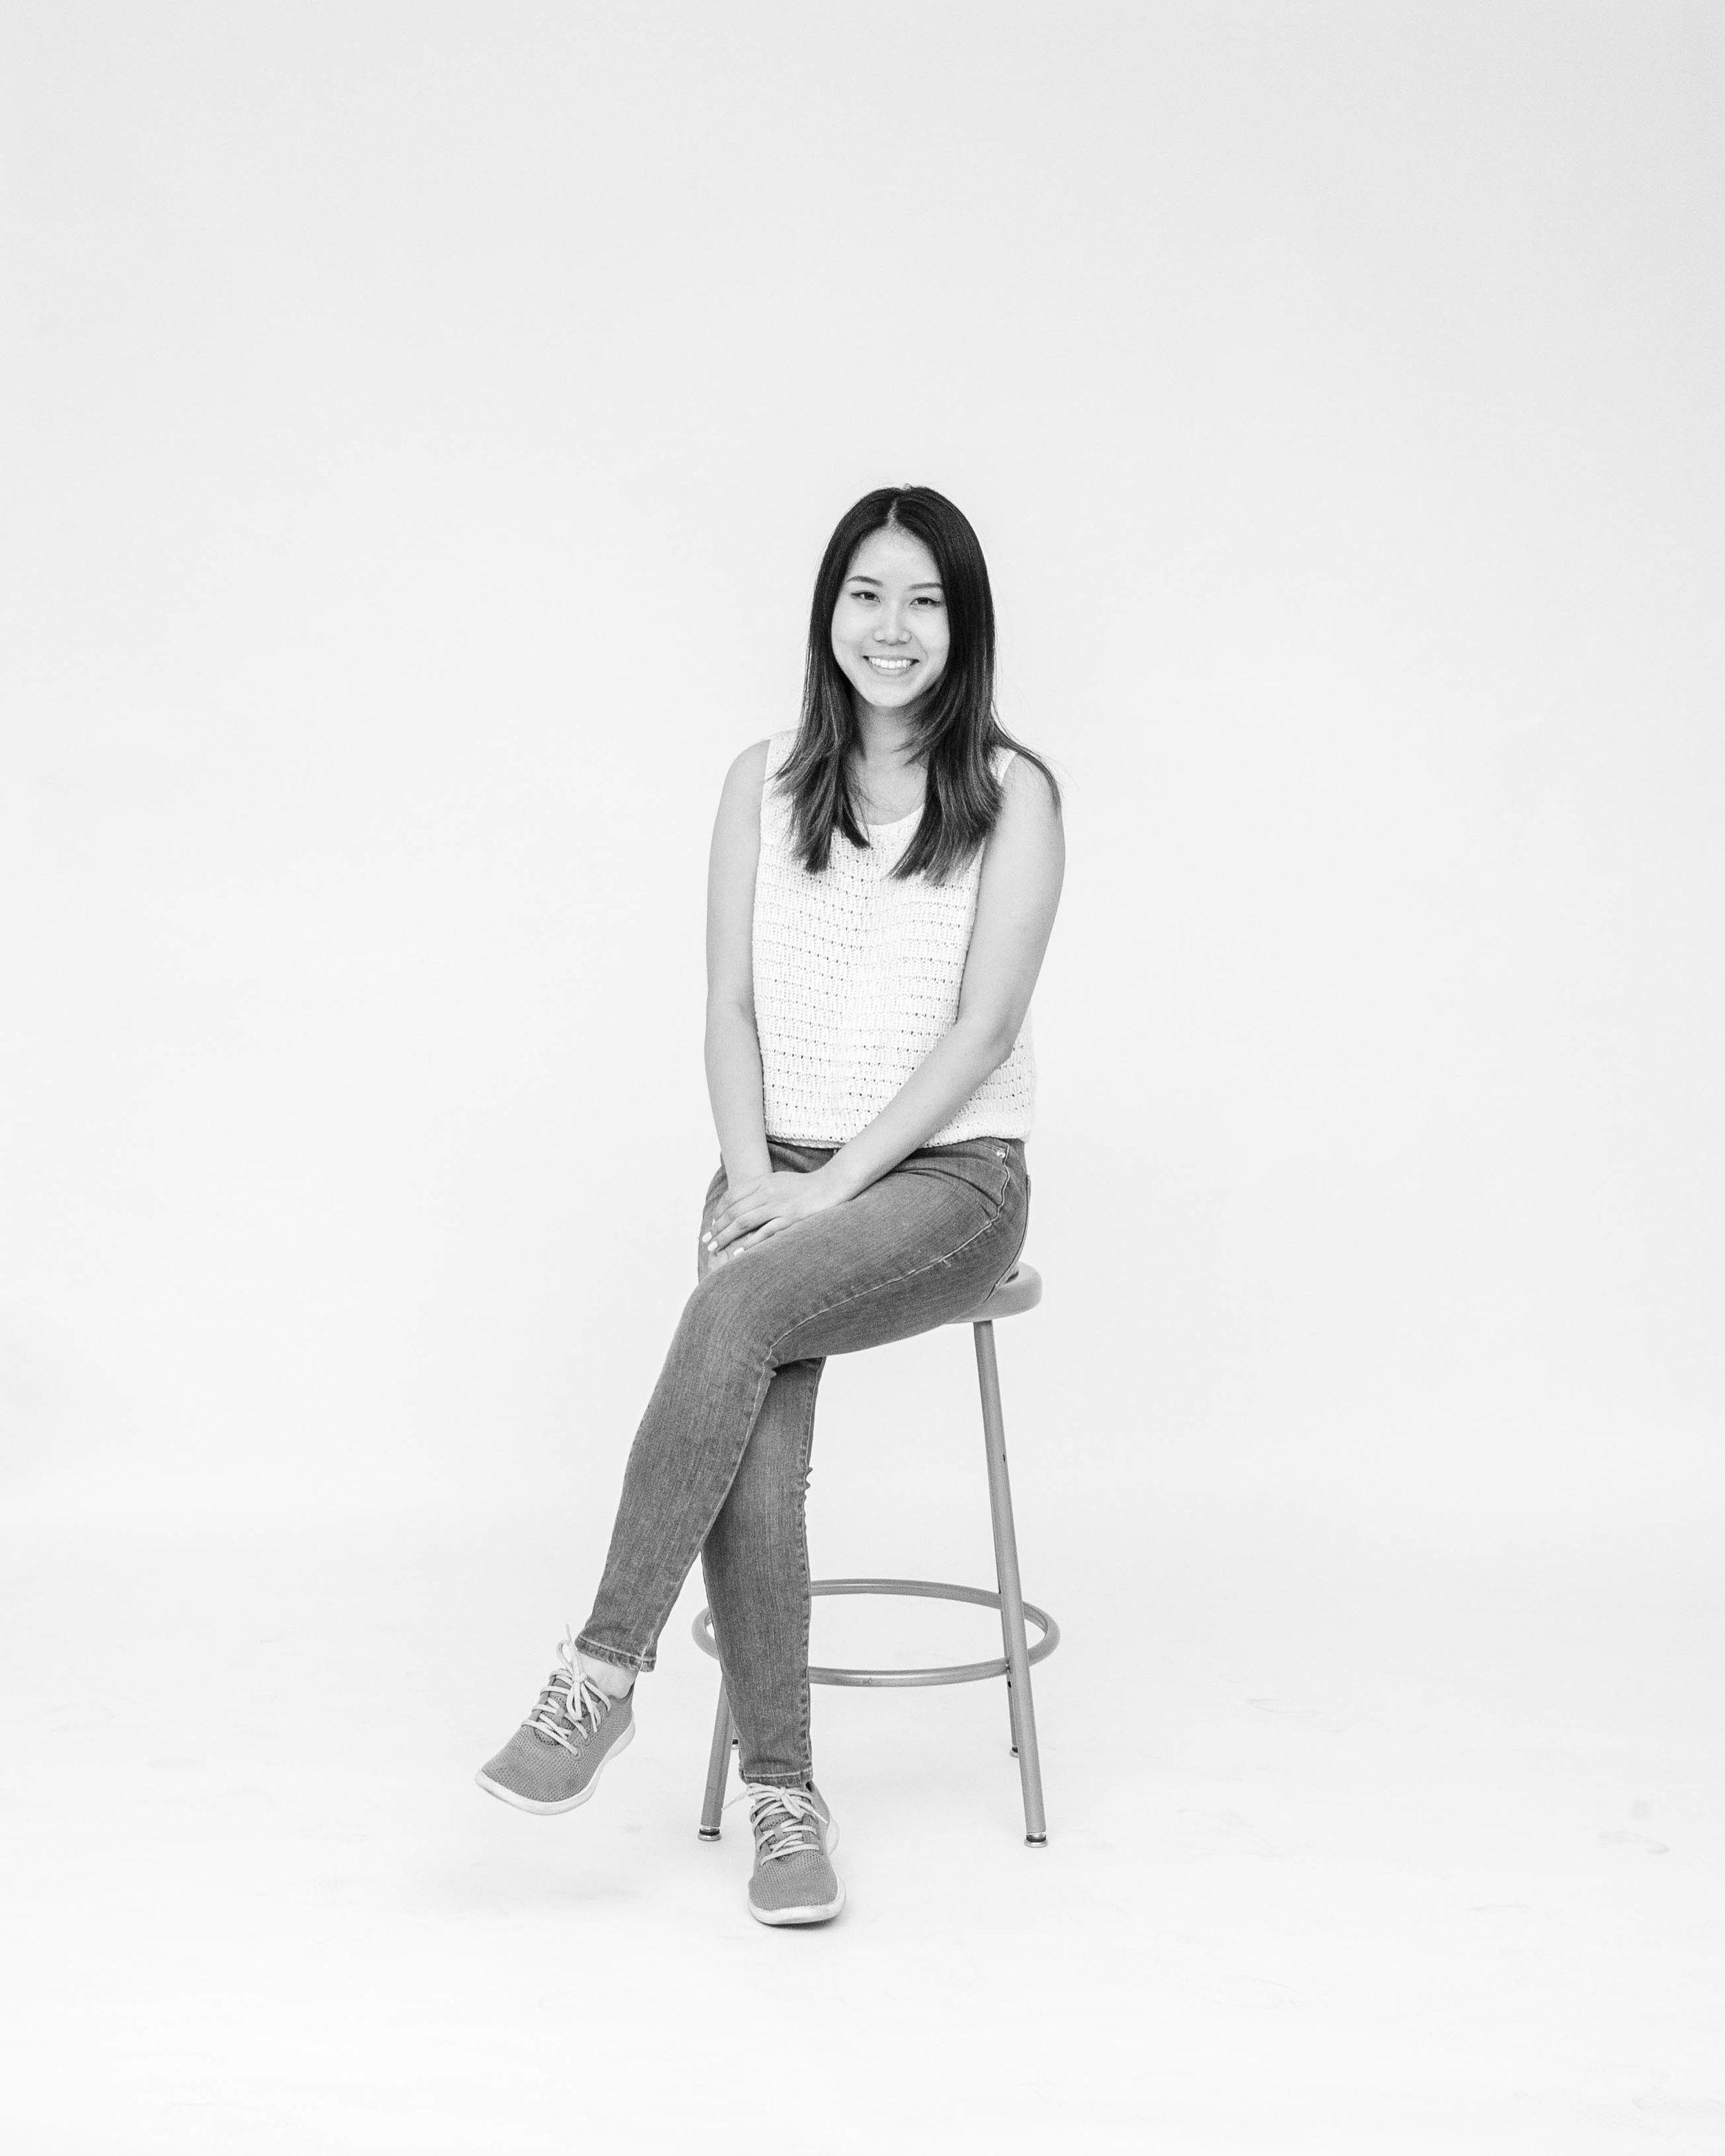 Mandy Sheng